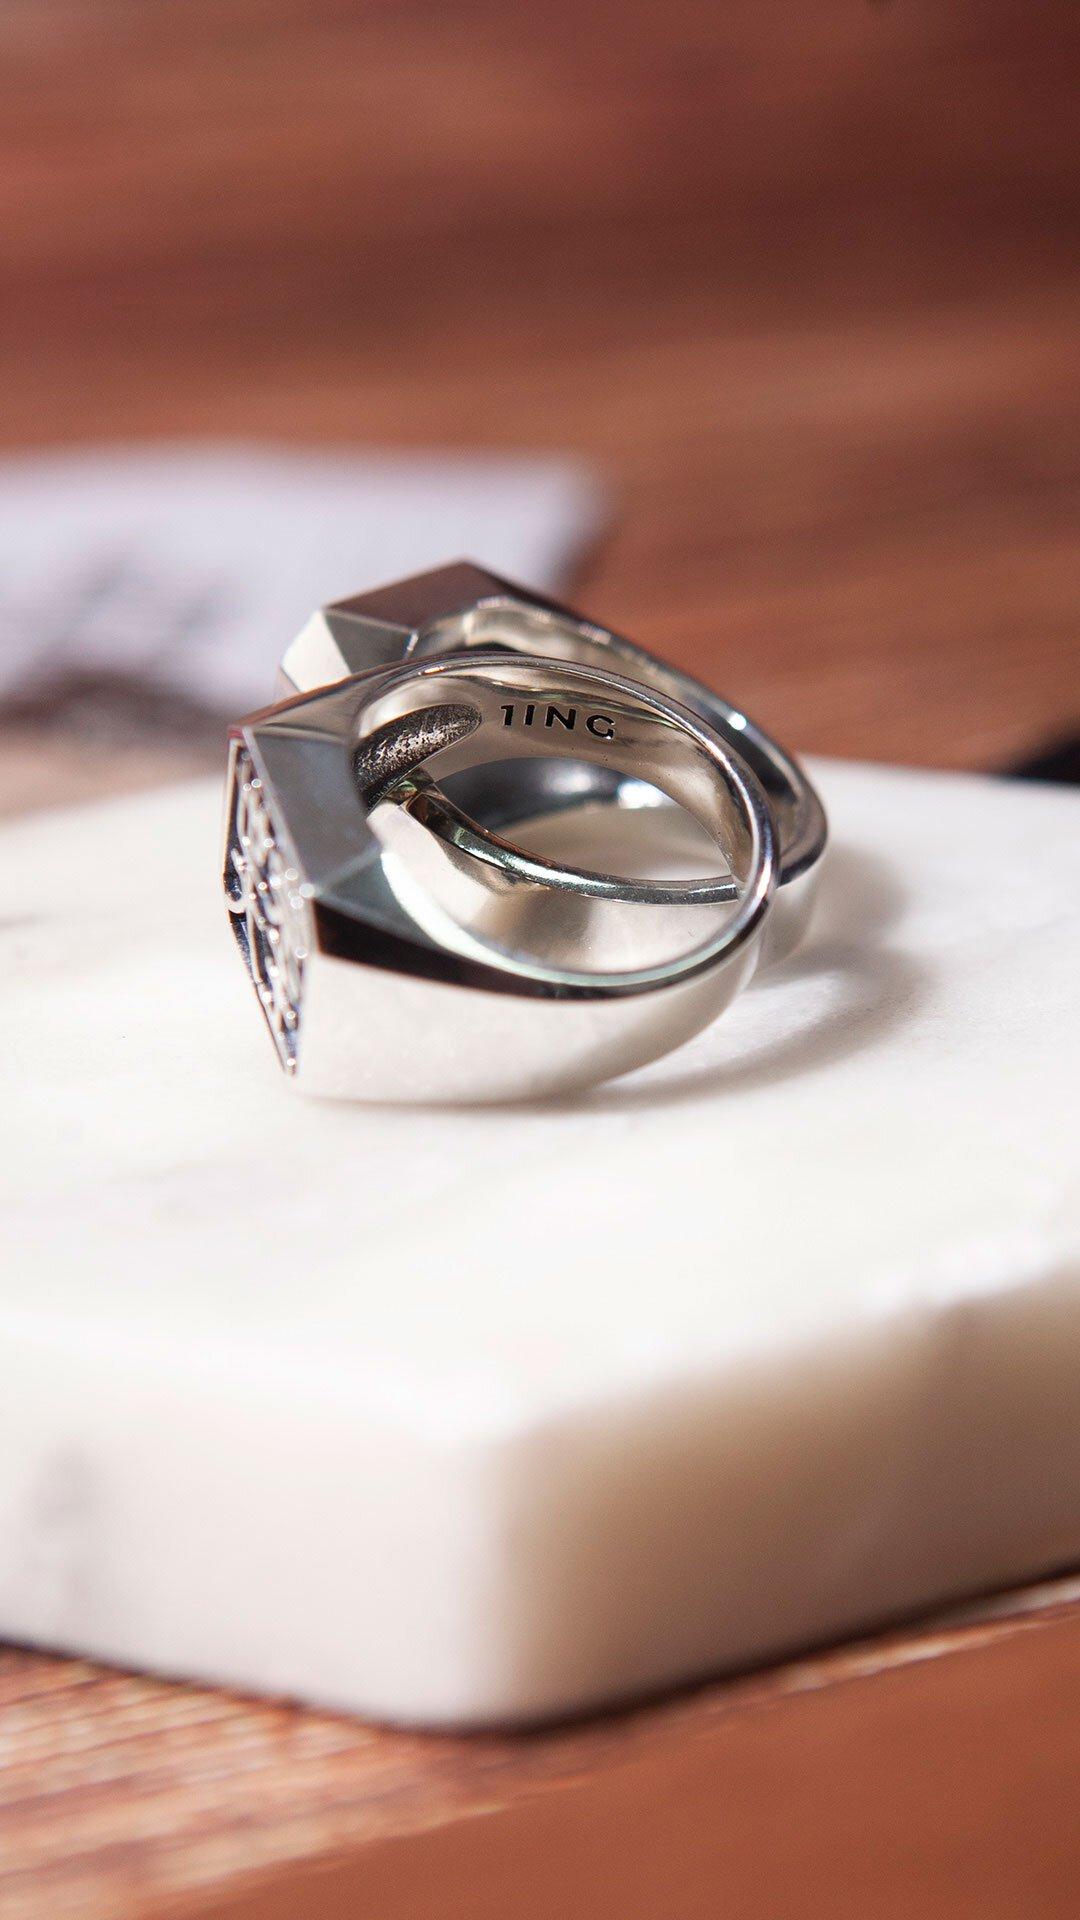 1ING[일링] 옥타곤 원링(각인) 은(Silver) 소재 컨셉 사진 2